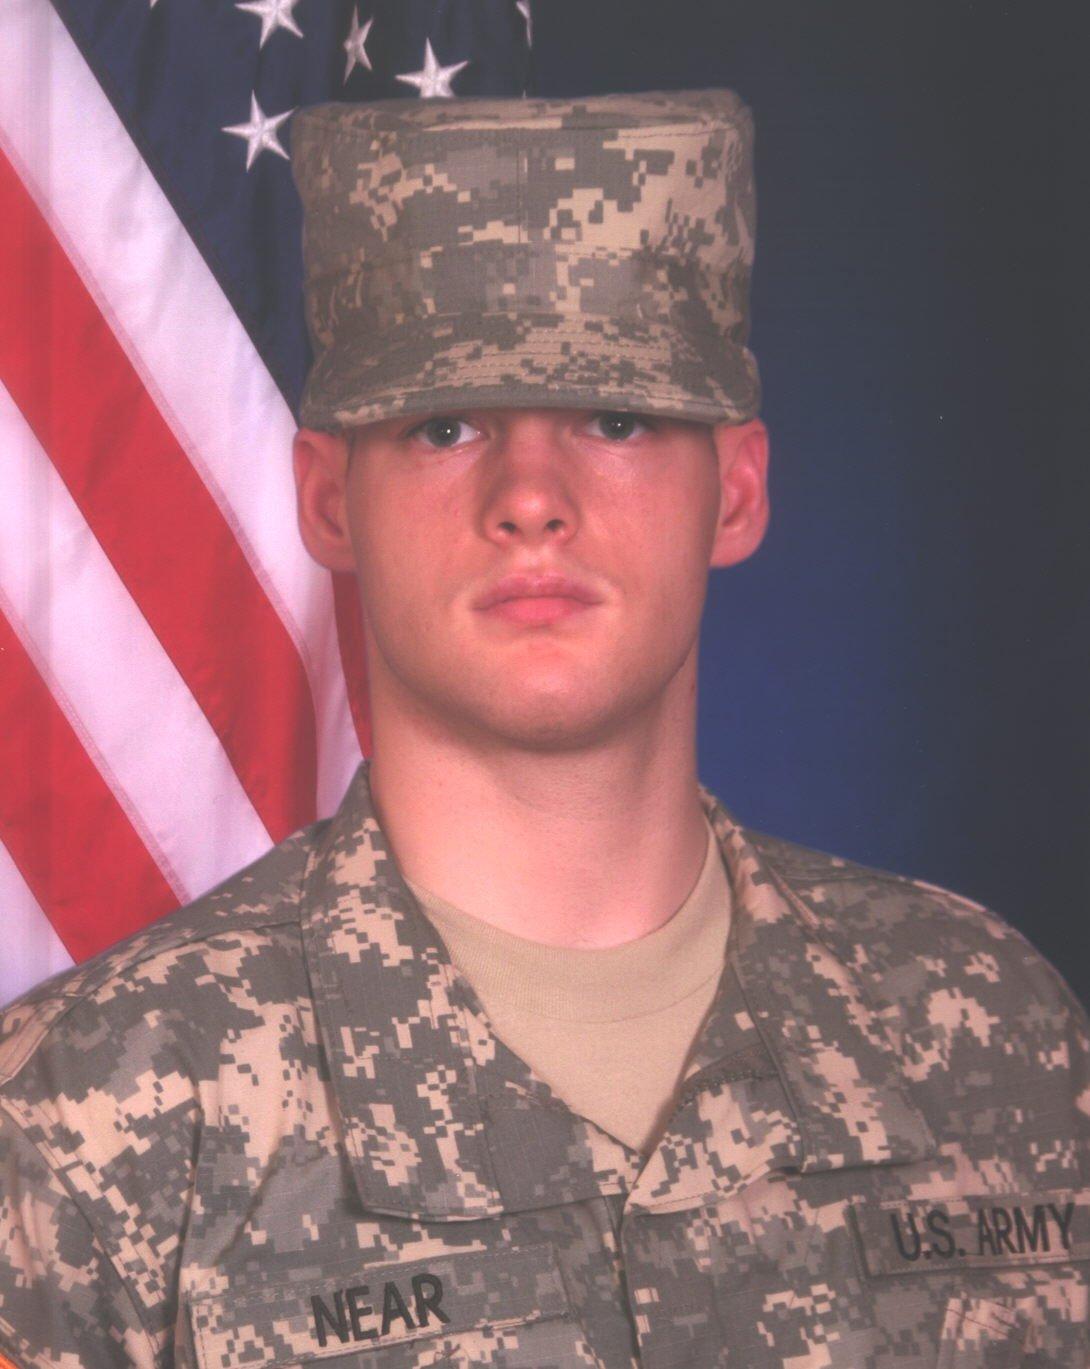 U.S. Army Pfc. Robert J. Near